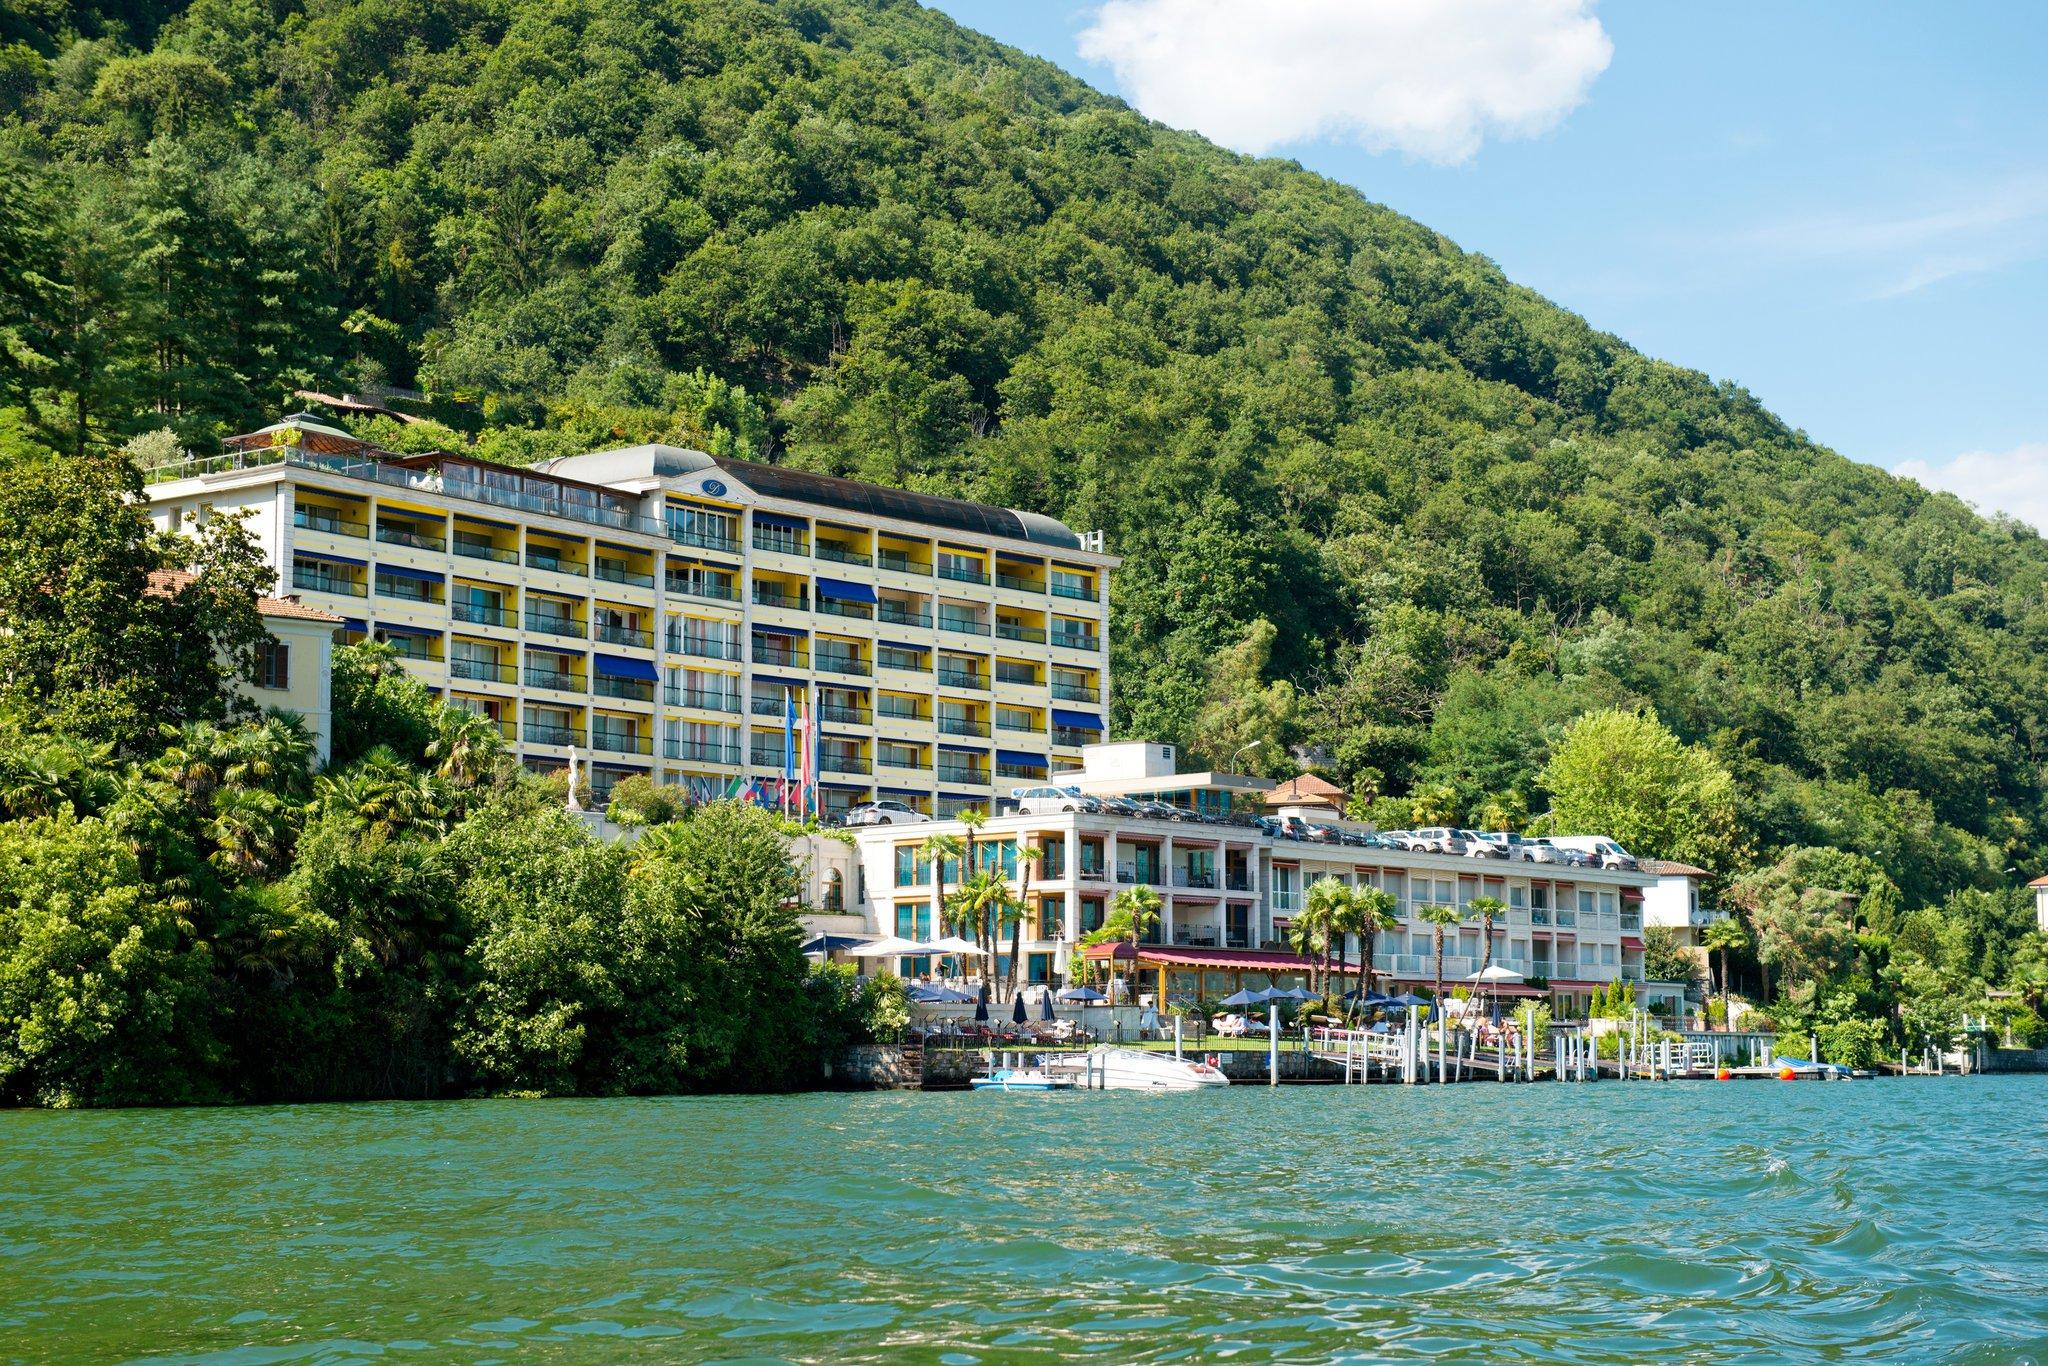 Swiss Diamond Hotel Lugano